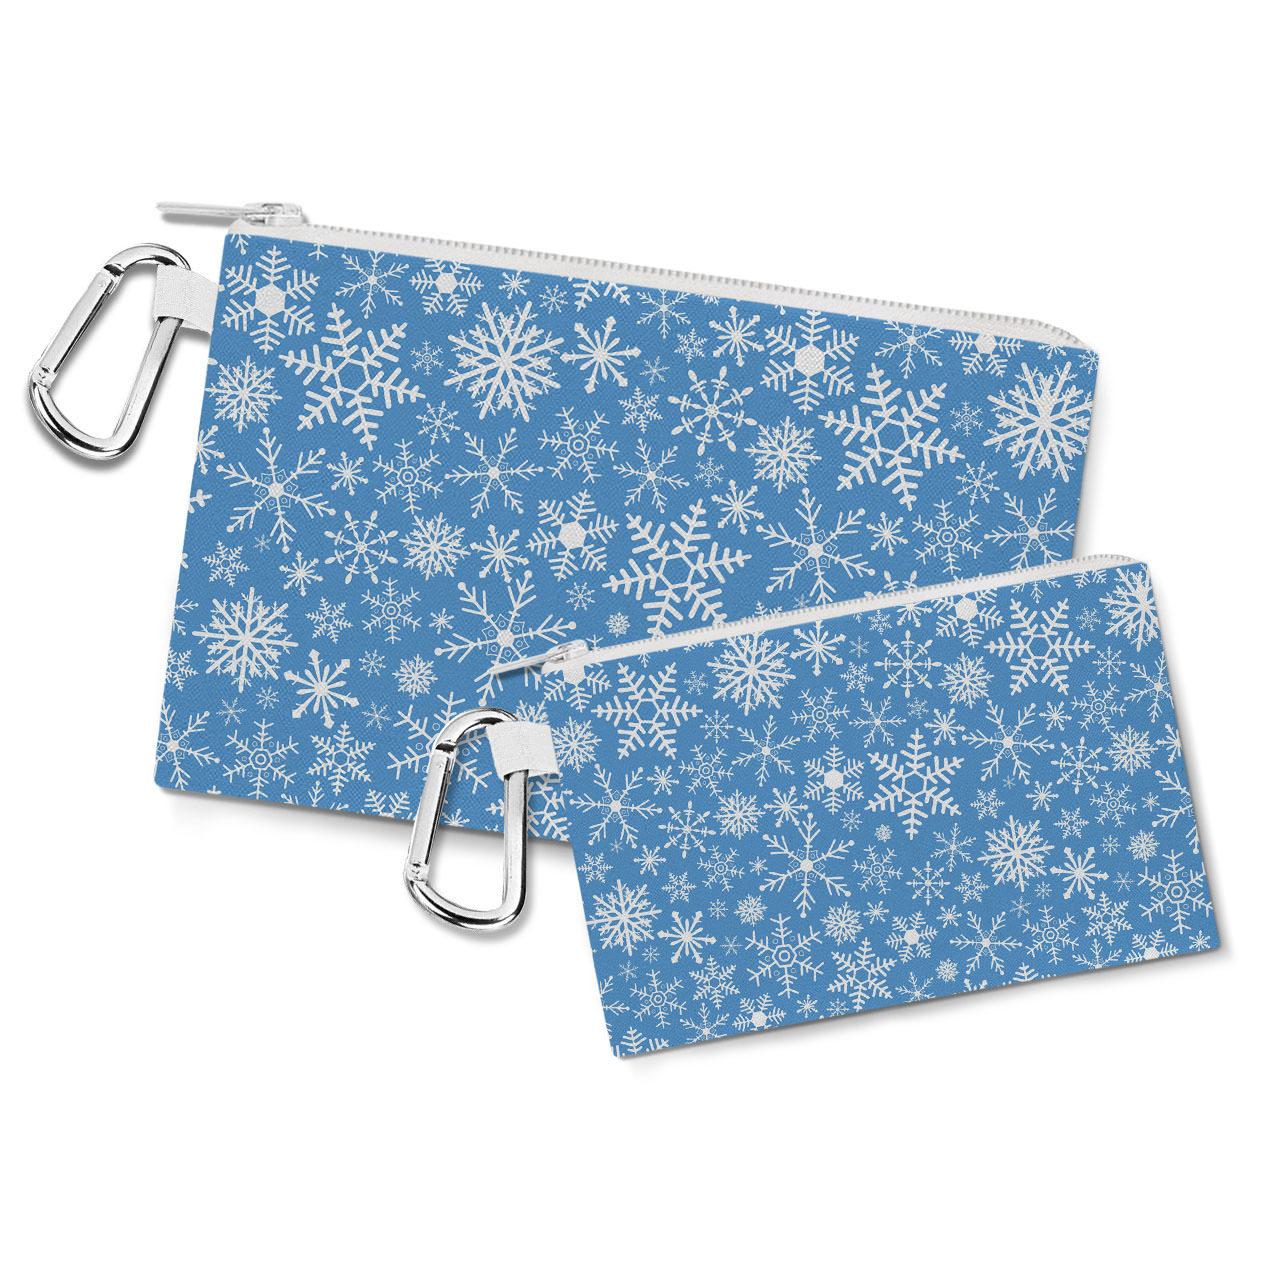 Snow Flakes Canvas Zip Pouch